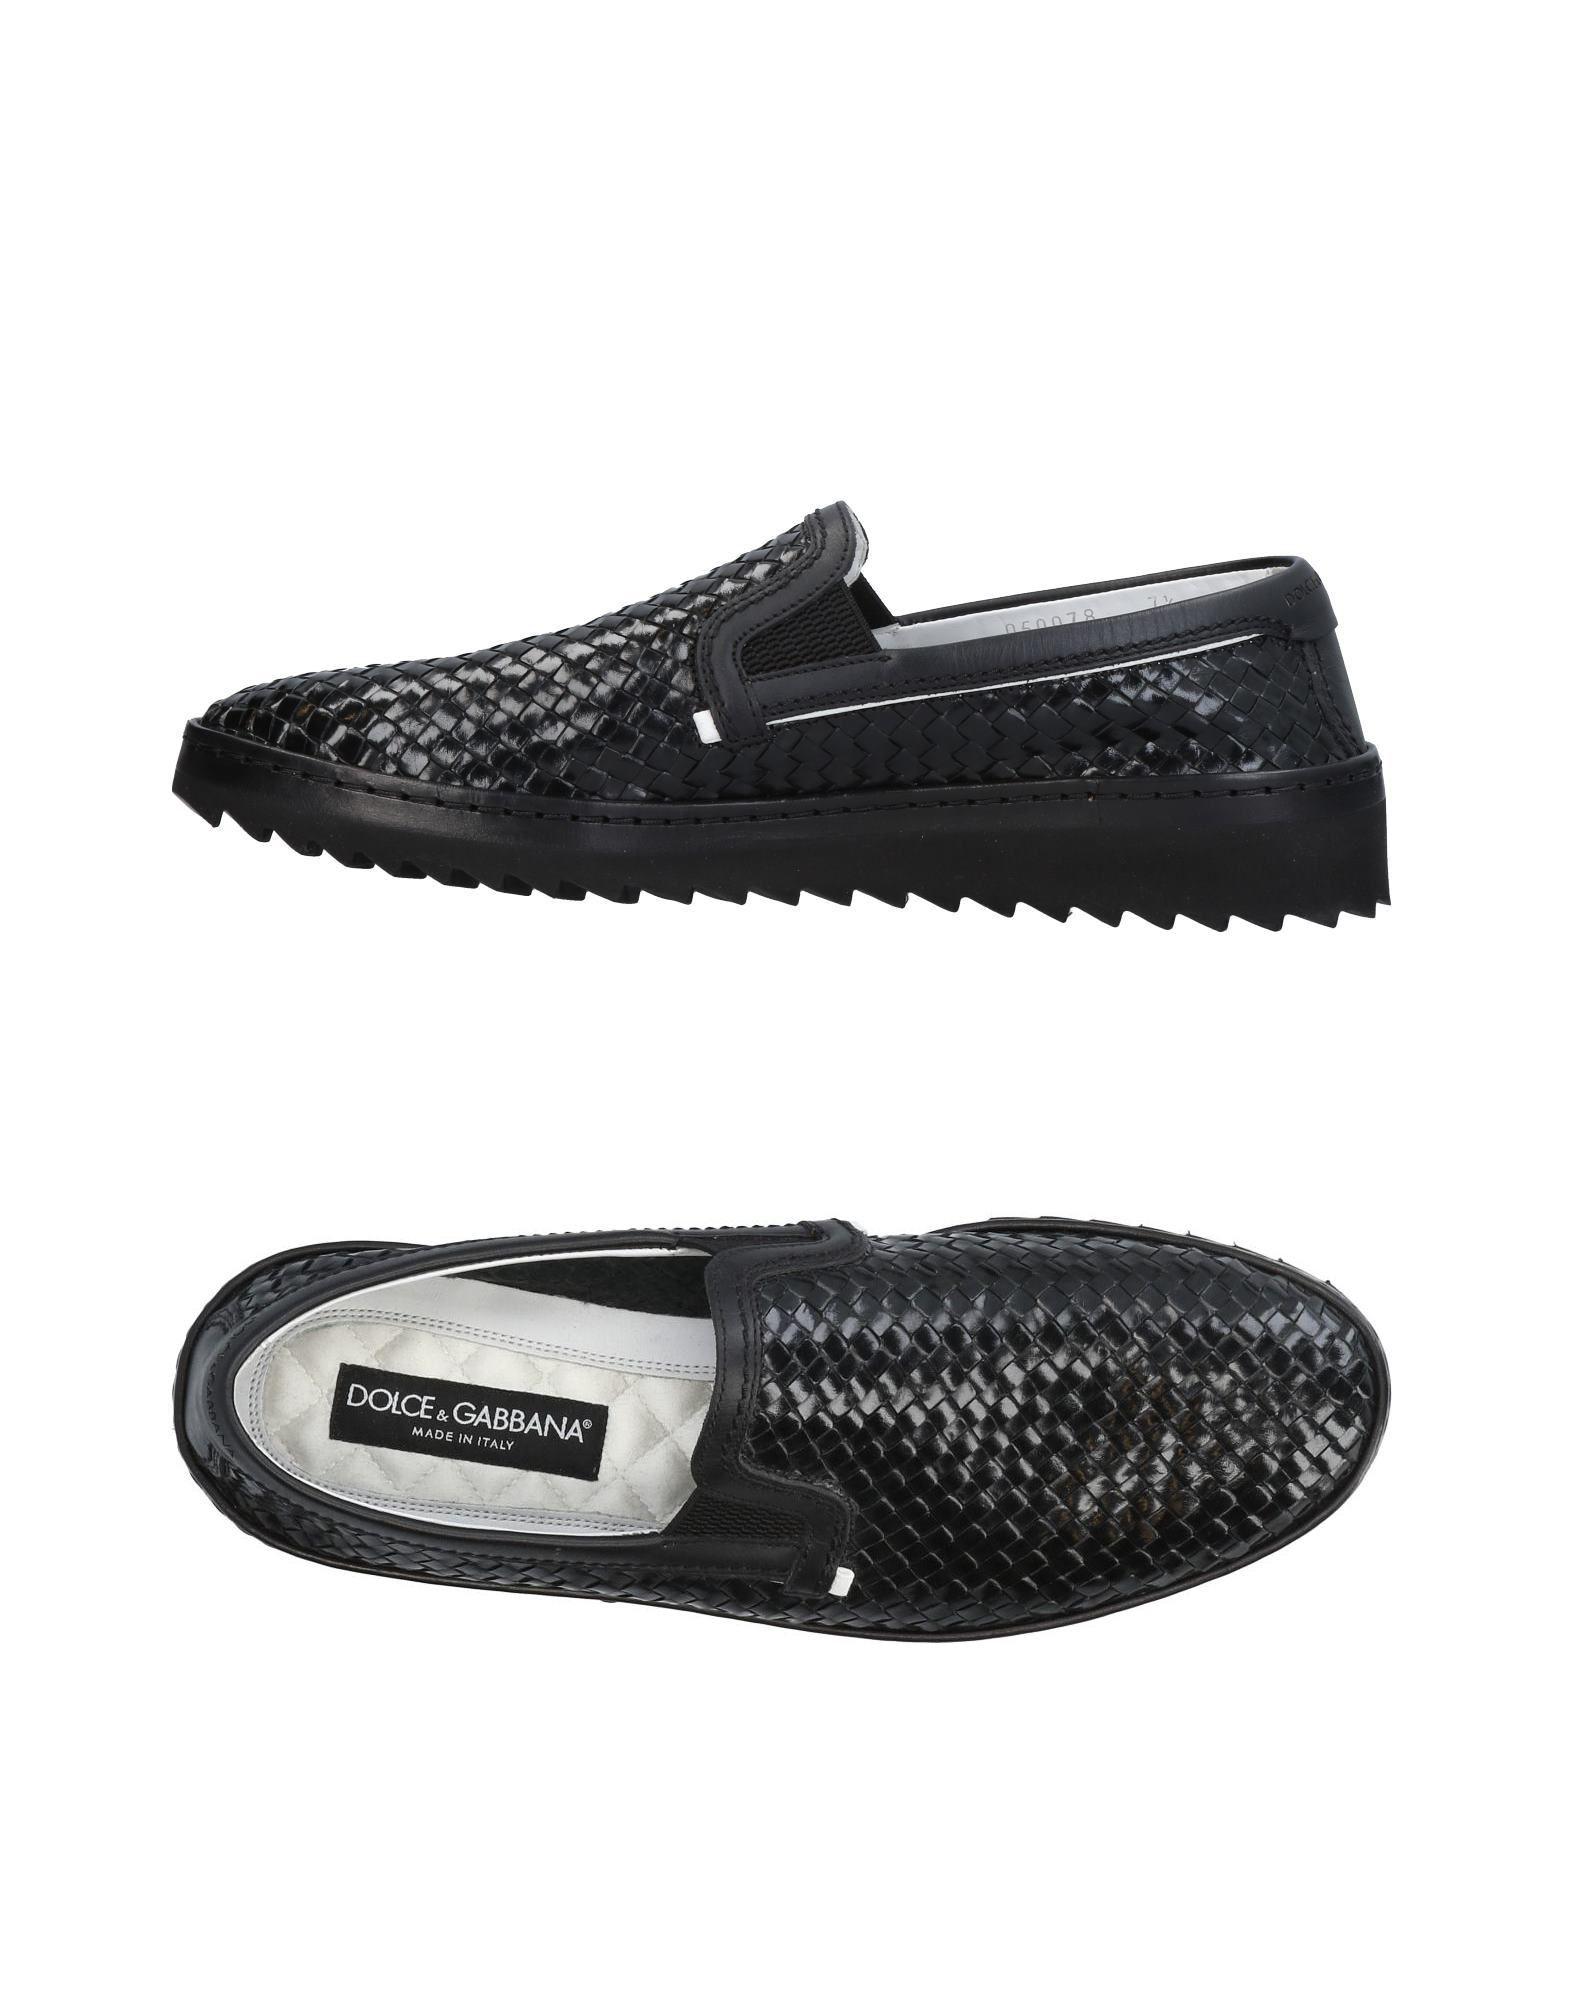 Sneakers Dolce & Gabbana - Uomo - Gabbana 11438417UX 17bdb6